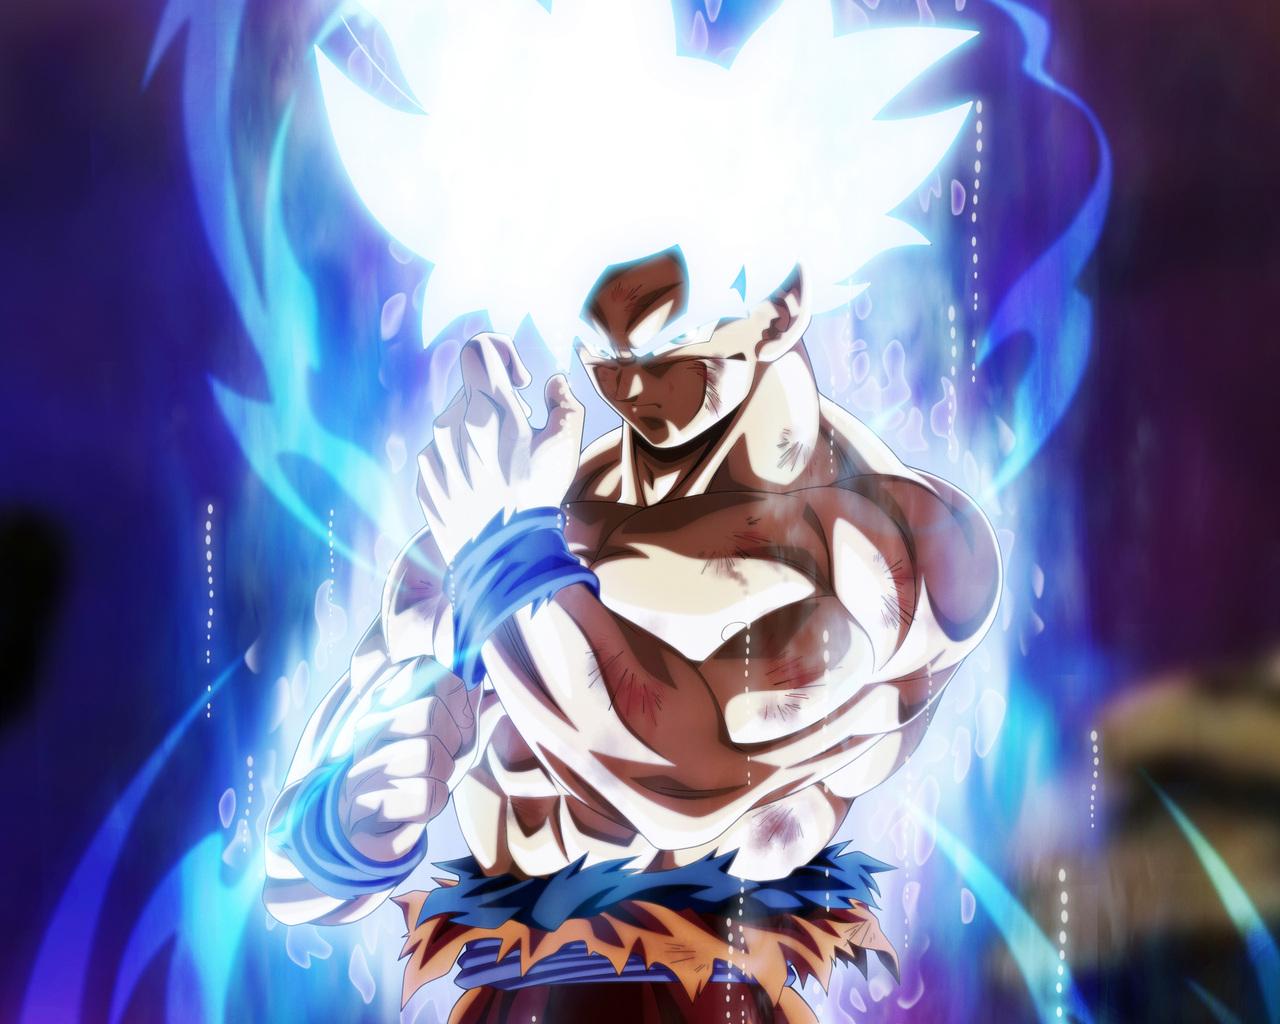 Download 56 Koleksi Anime Wallpaper Hd 1280 X 1024 Gratis Terbaik